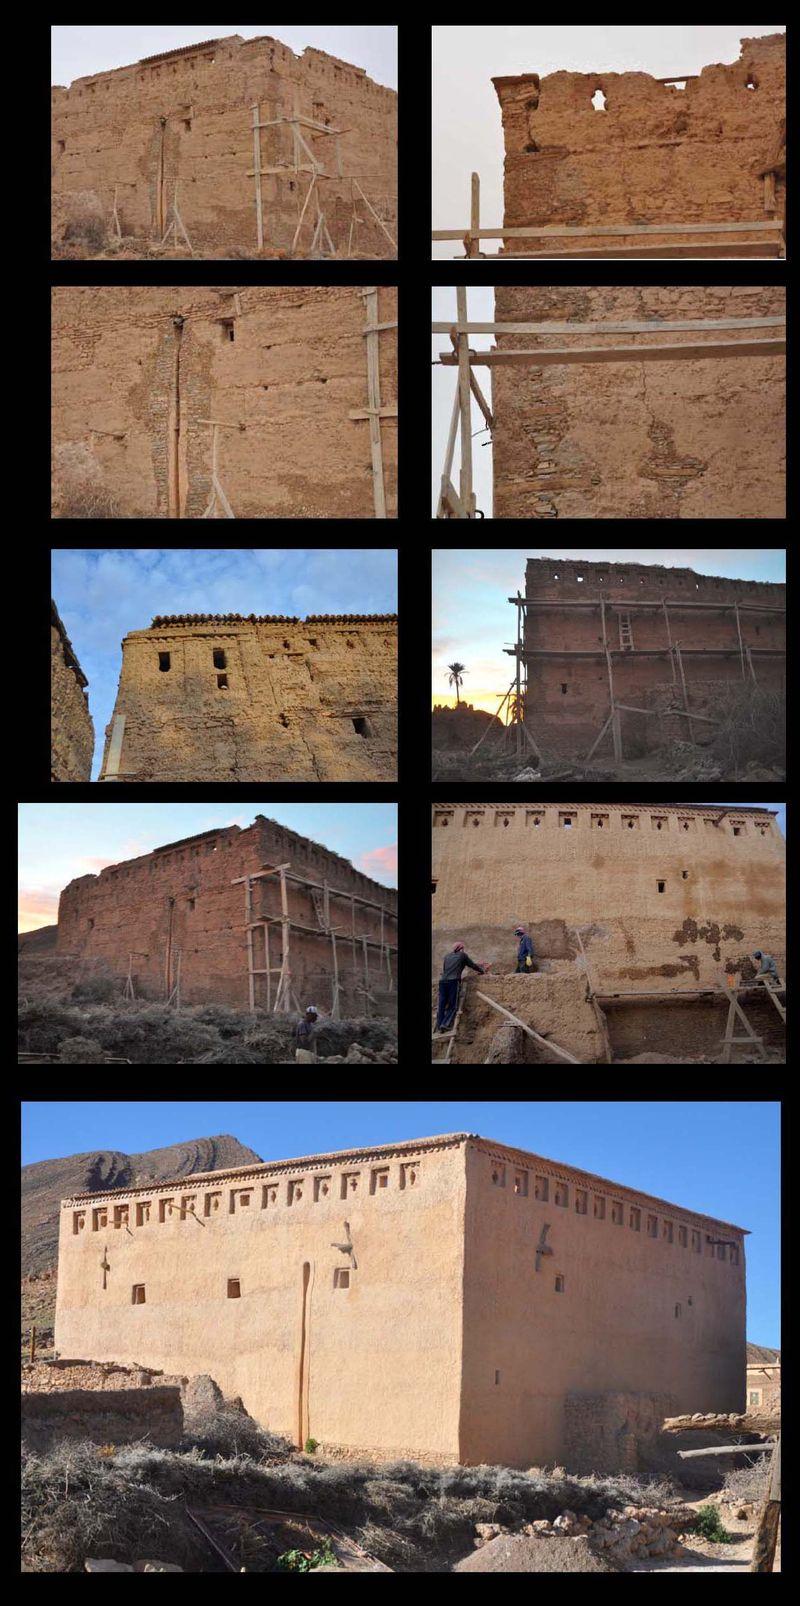 Vernacular_restauration_AK_Salima_naji_maroc